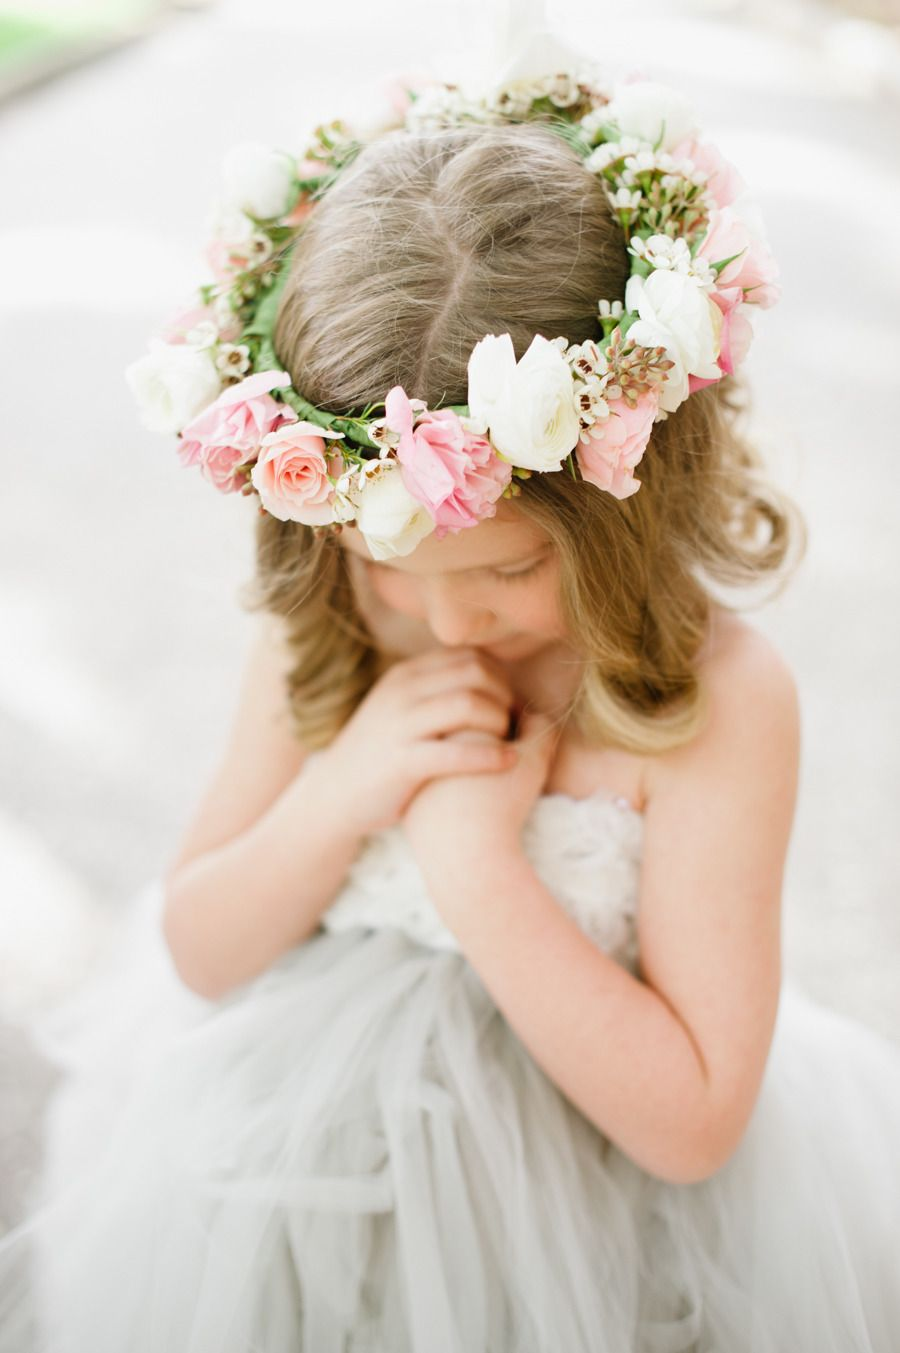 Sarasota fl wedding at ca dzan mansion mansion wreaths and floral crowns for the flower girls izmirmasajfo